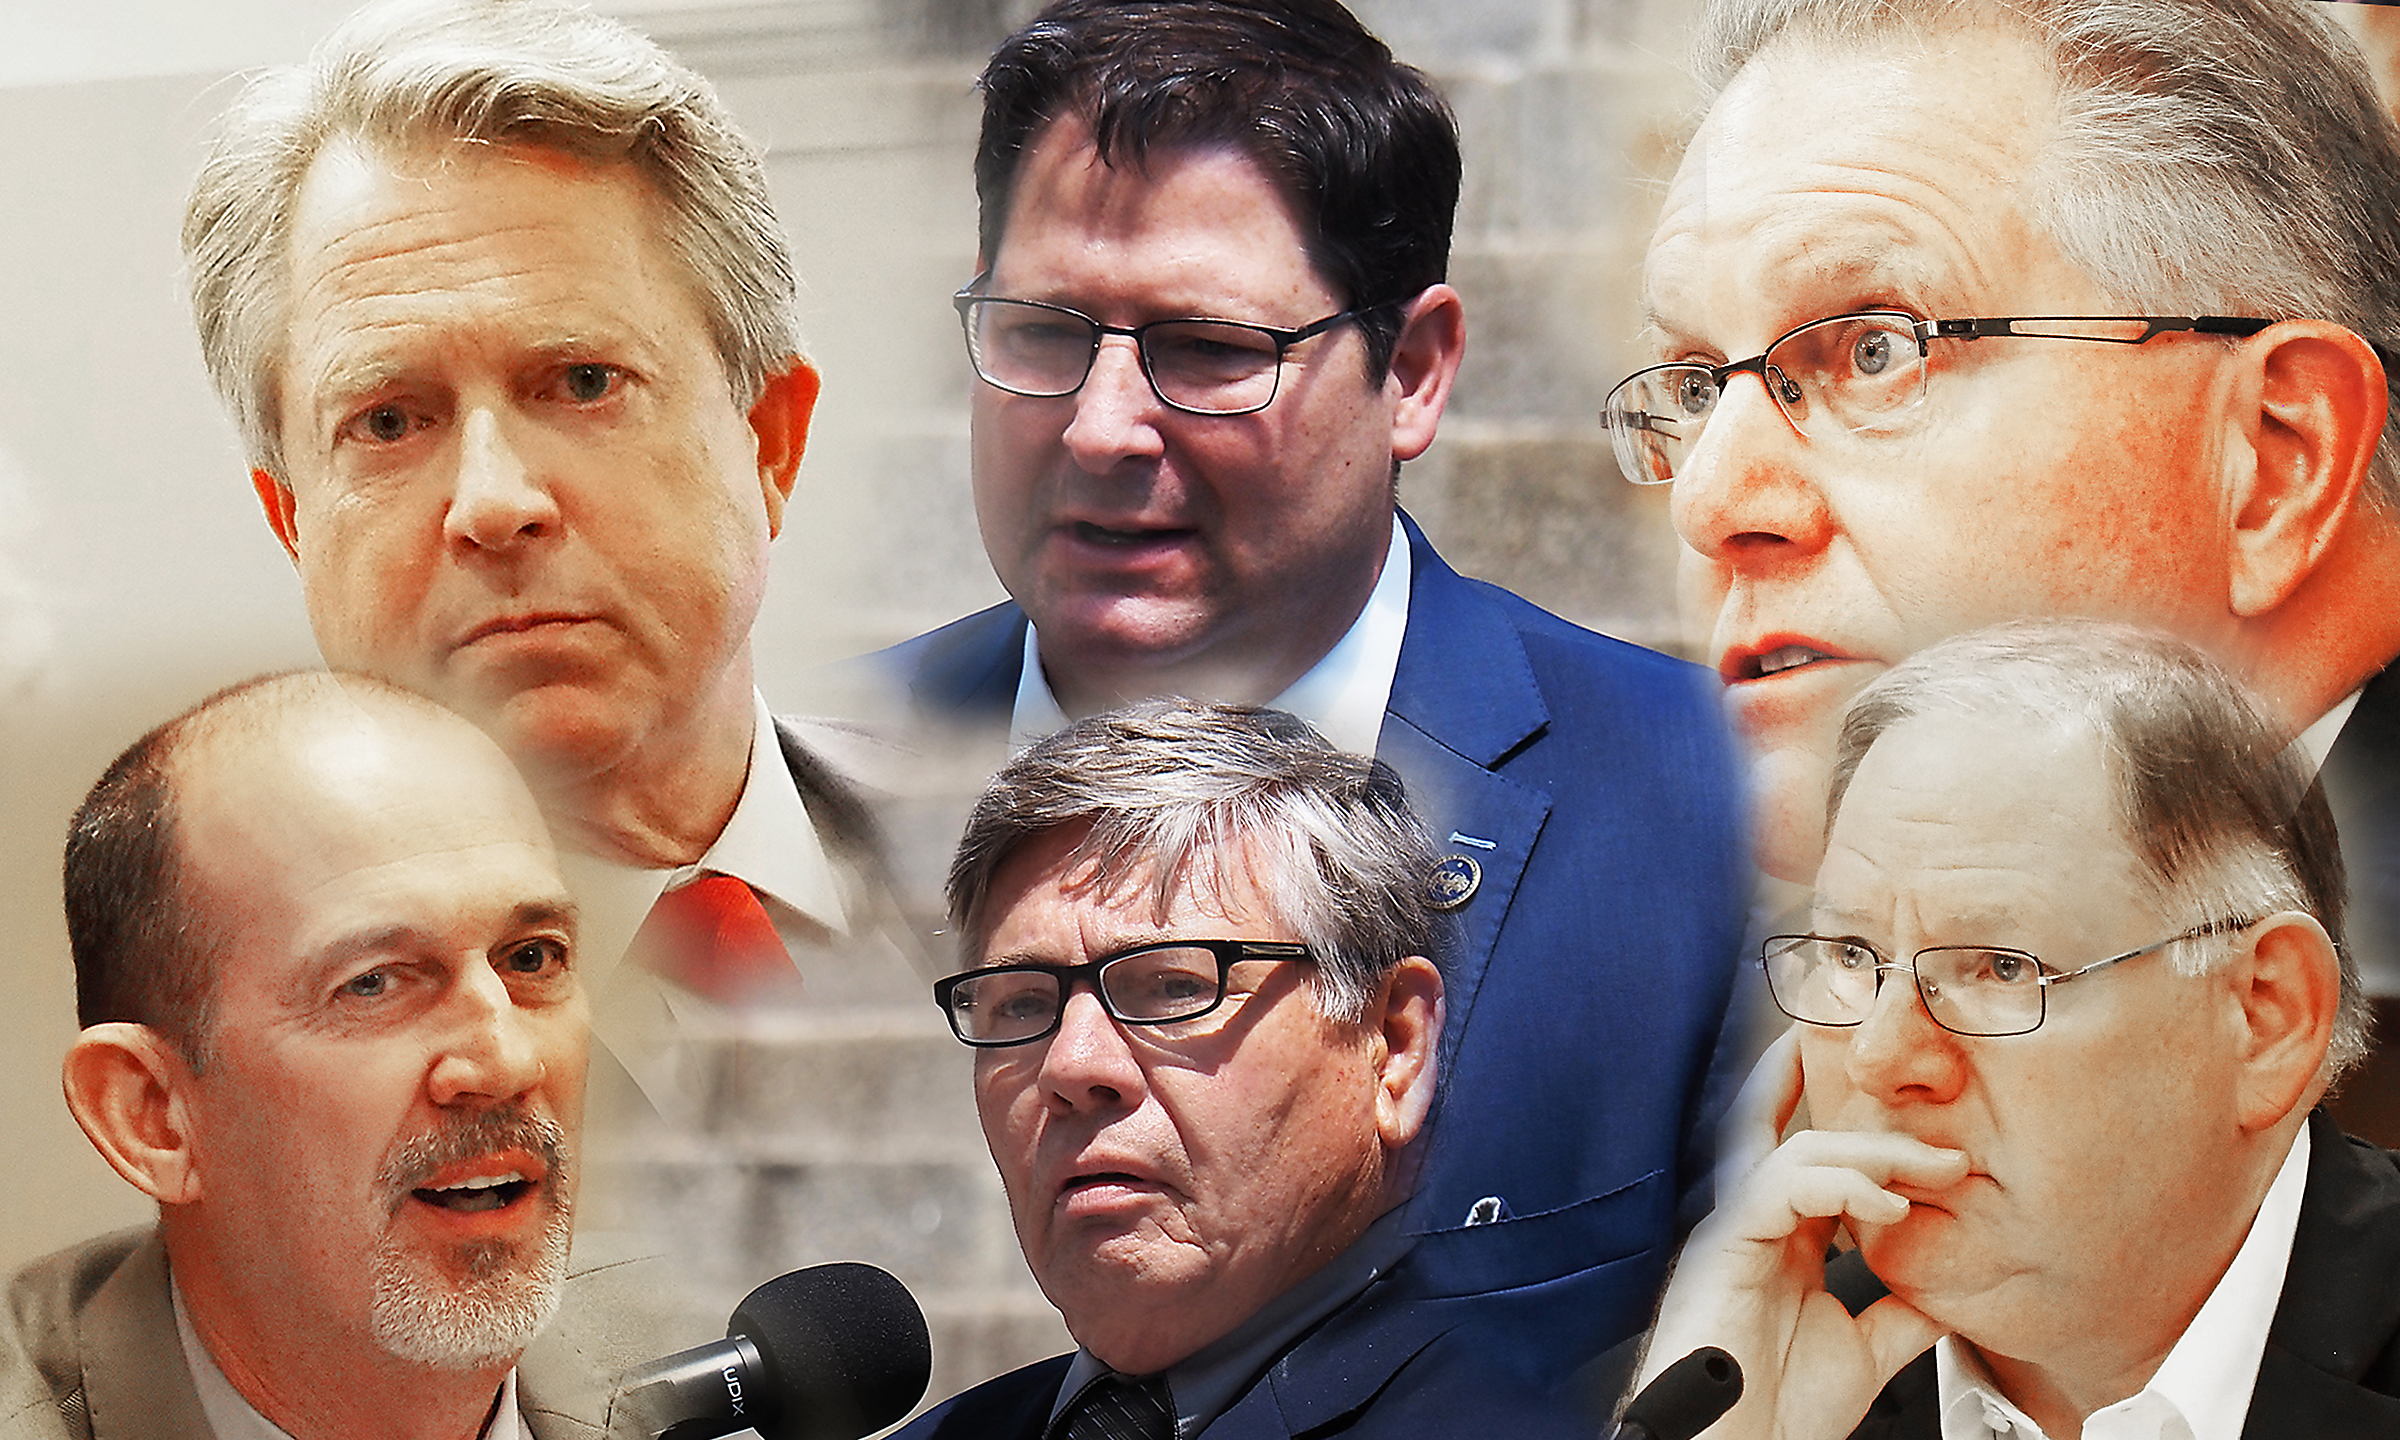 Disinformation caucus of Kansas GOP spreads dangerous falsehoods about COVID